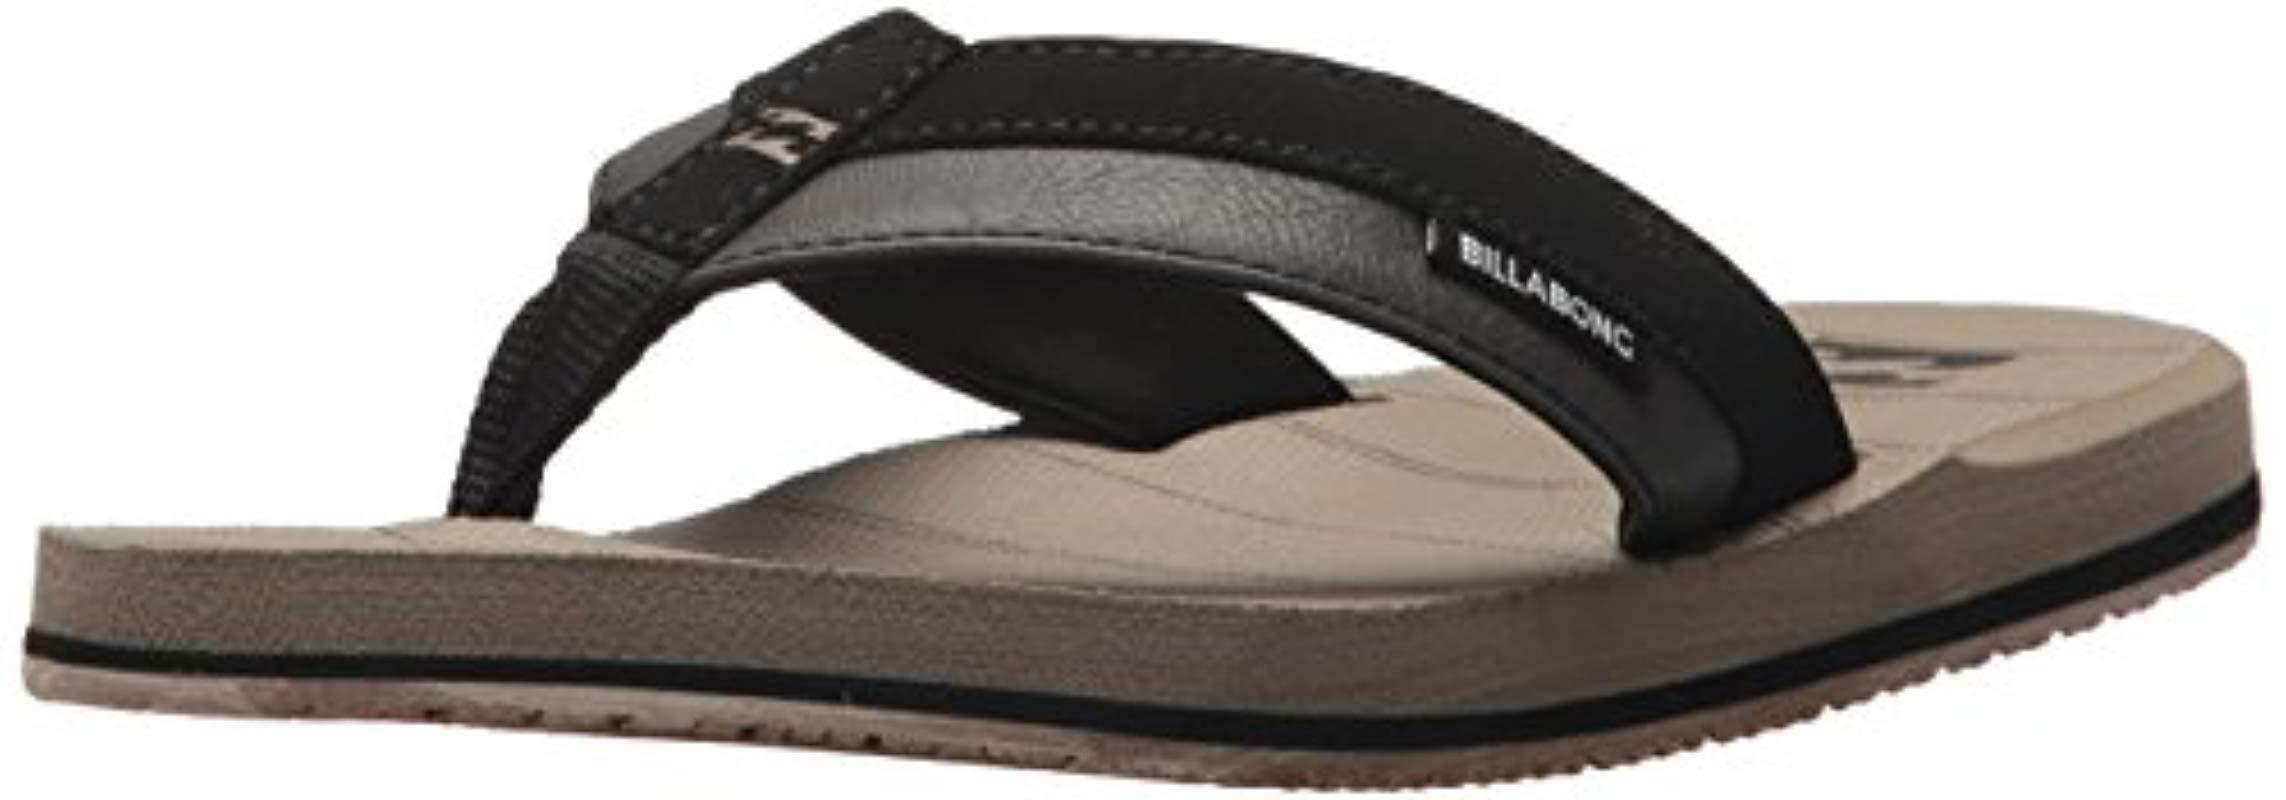 bd749643d43bc Lyst - Billabong All Day Impact Print Sandal Flip-flop for Men